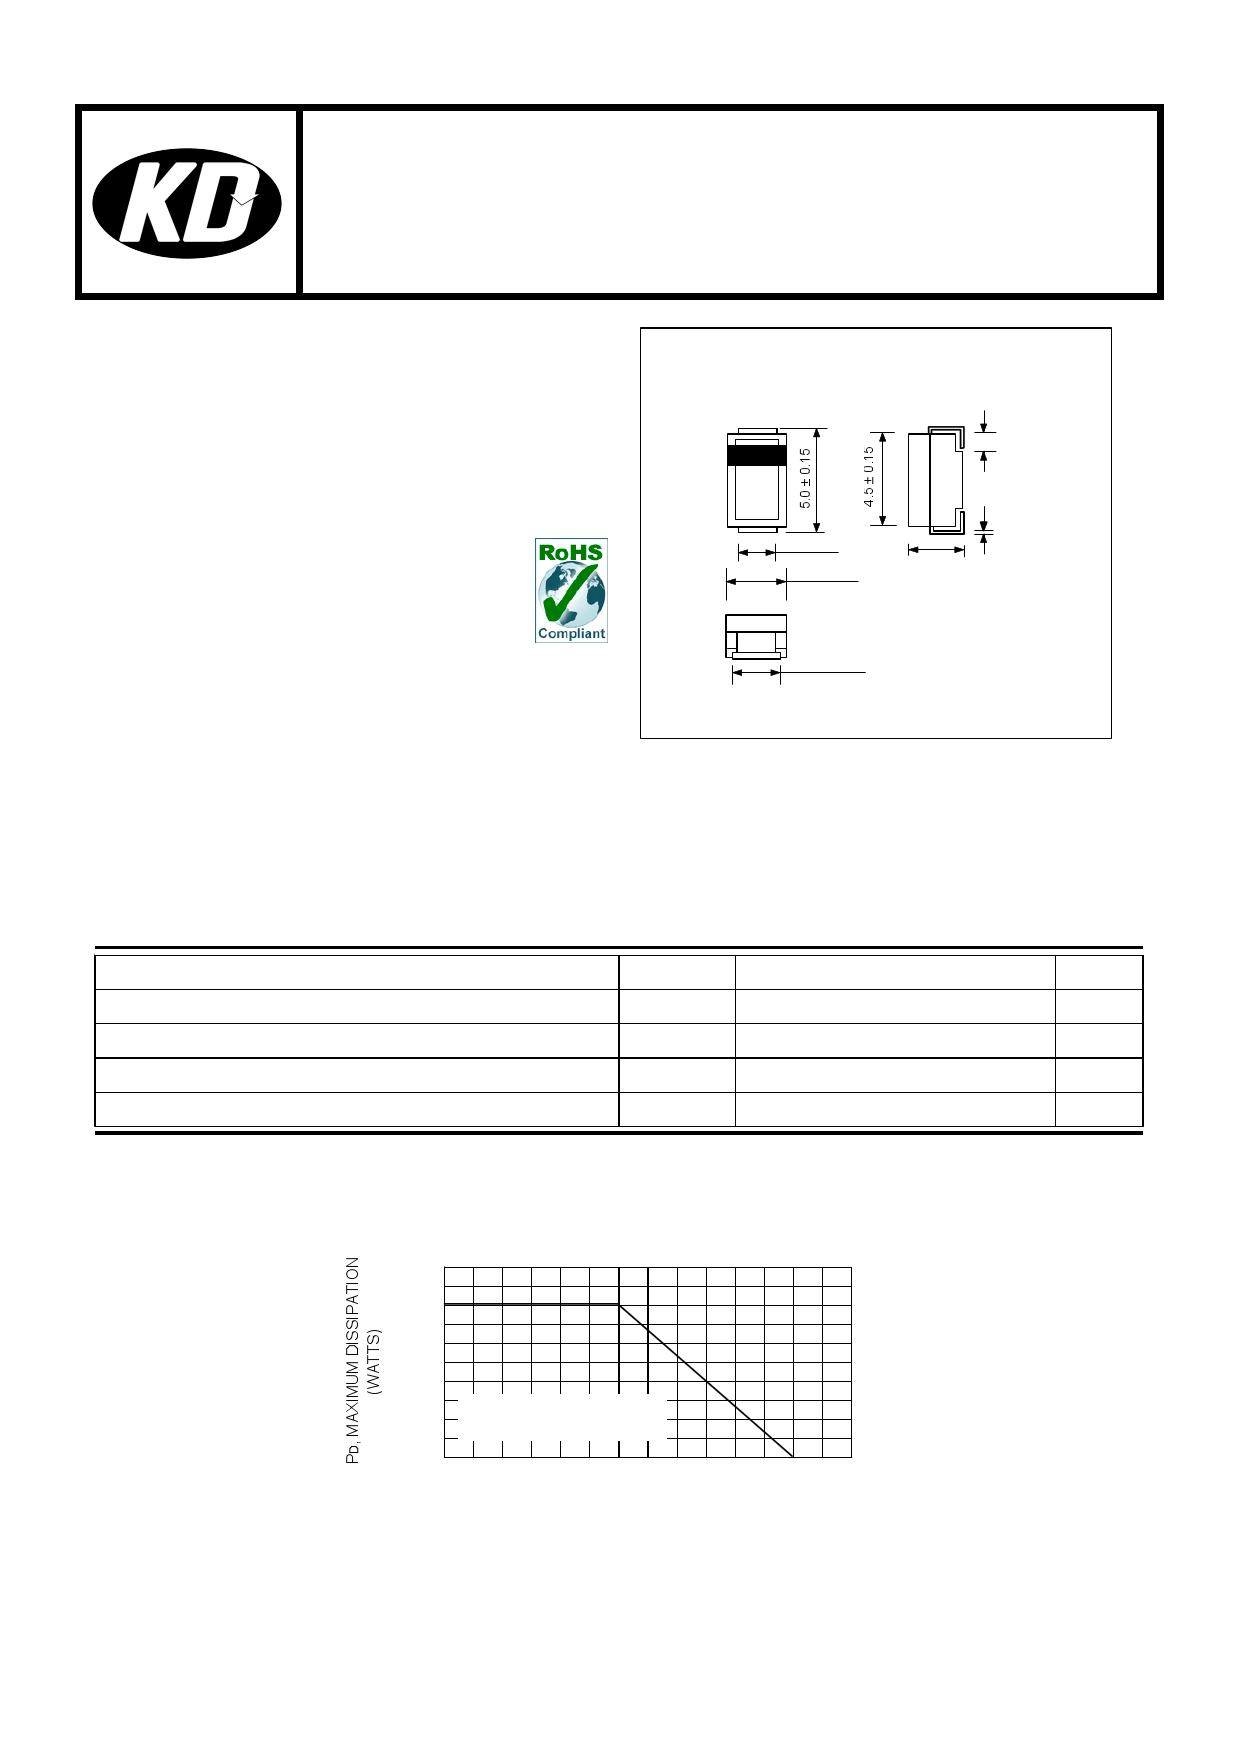 SZ4082 datasheet, circuit